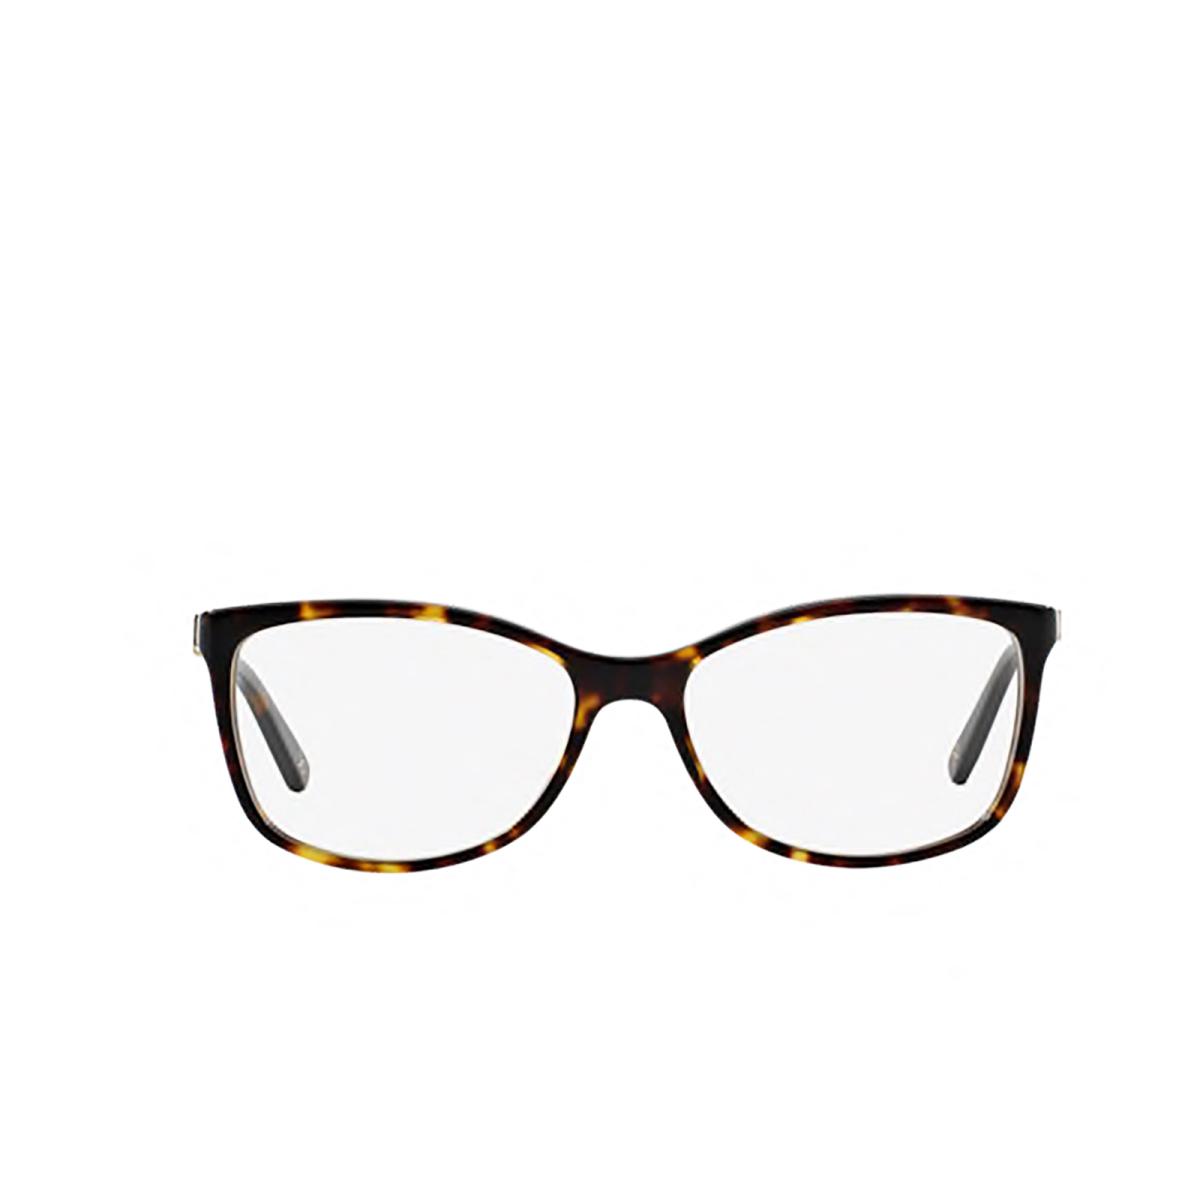 Dolce & Gabbana® Square Eyeglasses: DG3107 color 502 - front view.